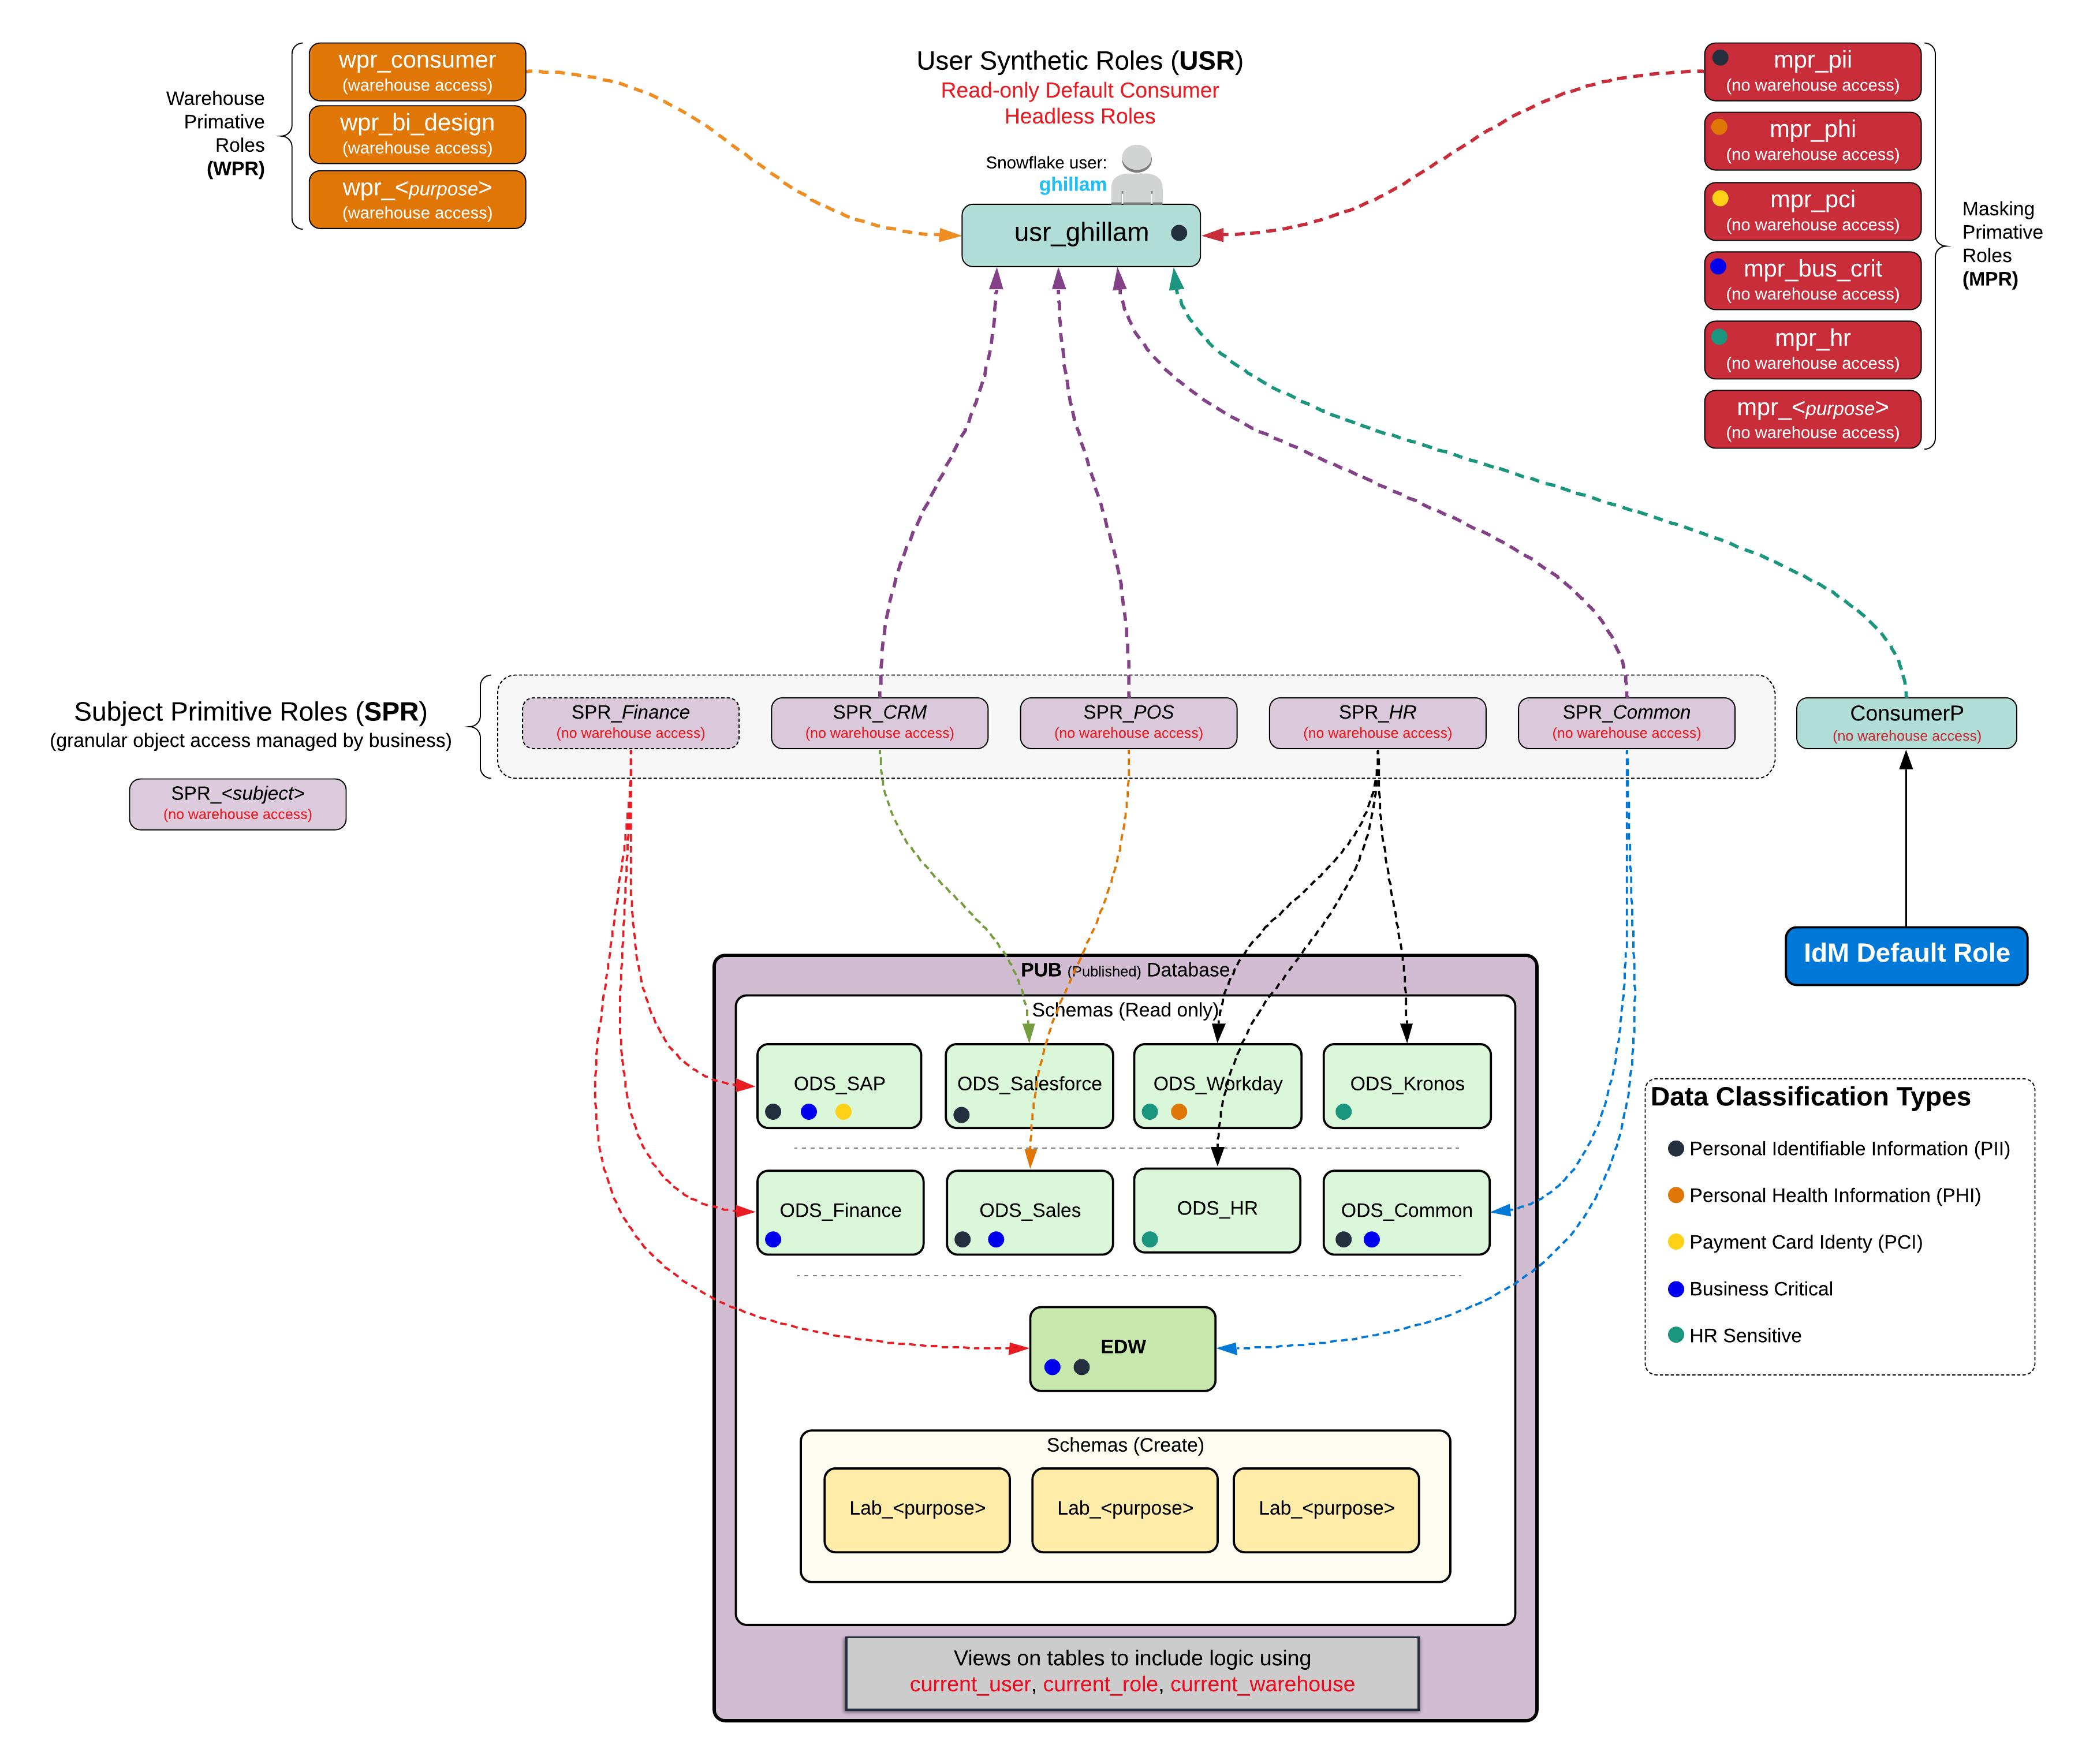 Access Control + Sensitive Data